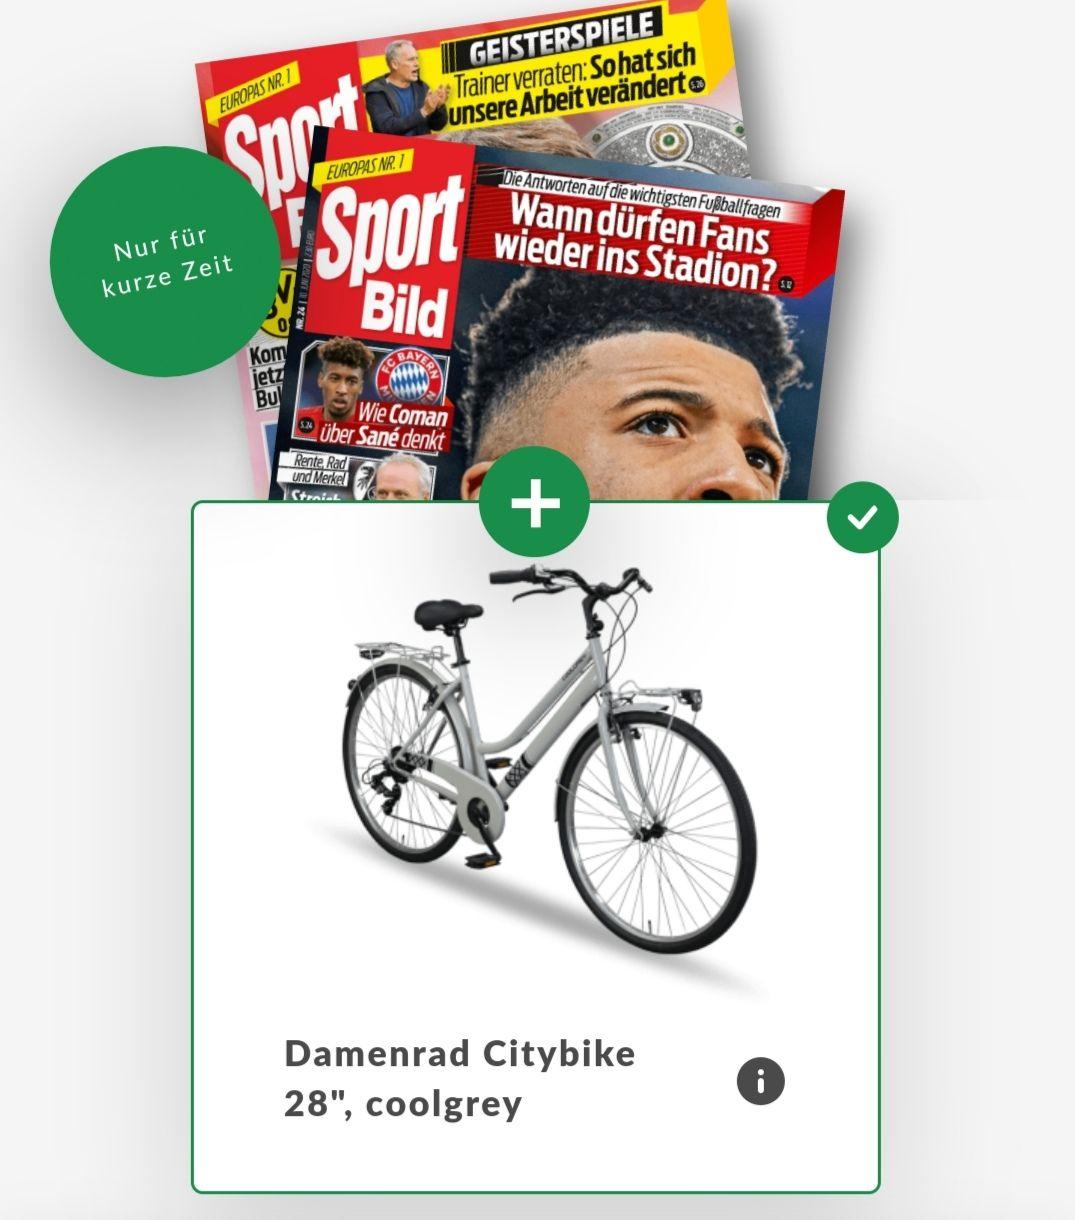 2 Jahres Abo SportBild inkl. City Fahrrad als Geschenk